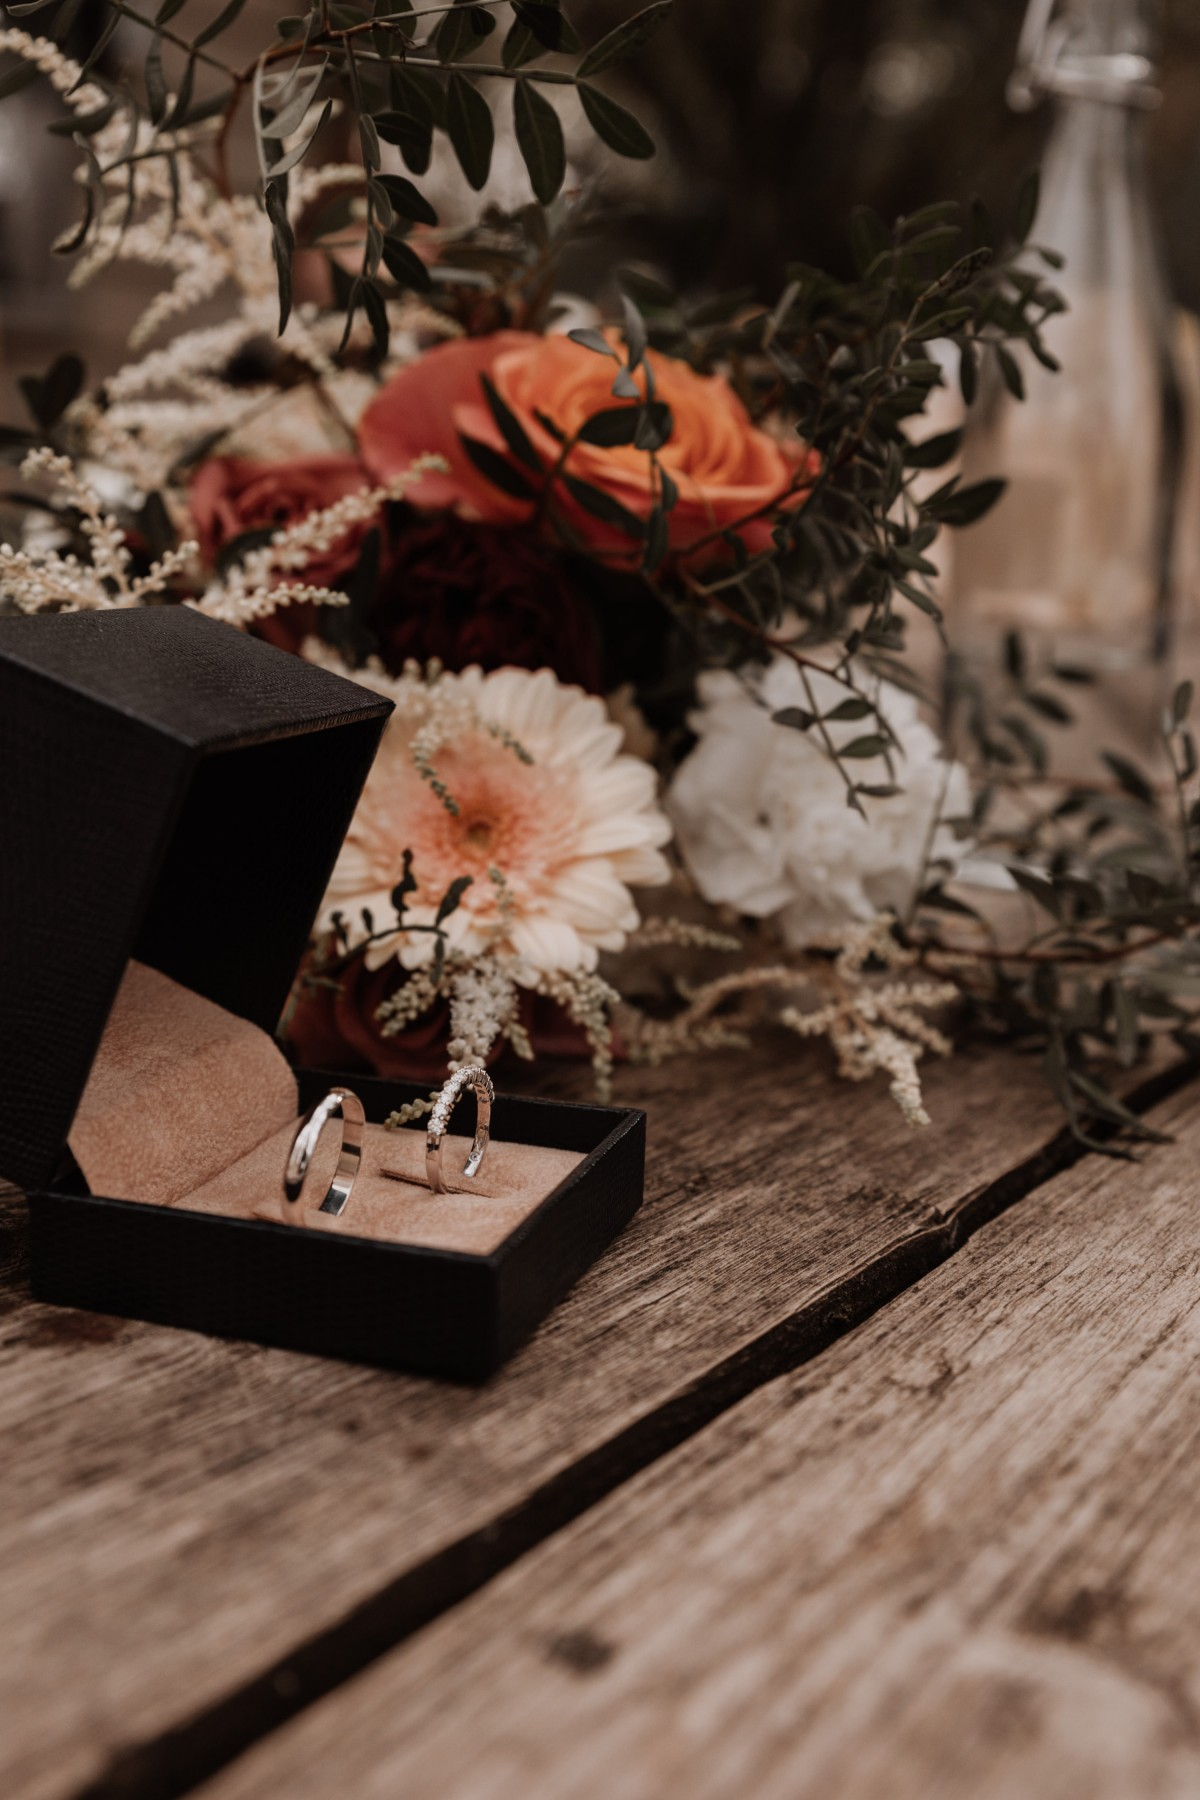 Wondrous Weddings & Events